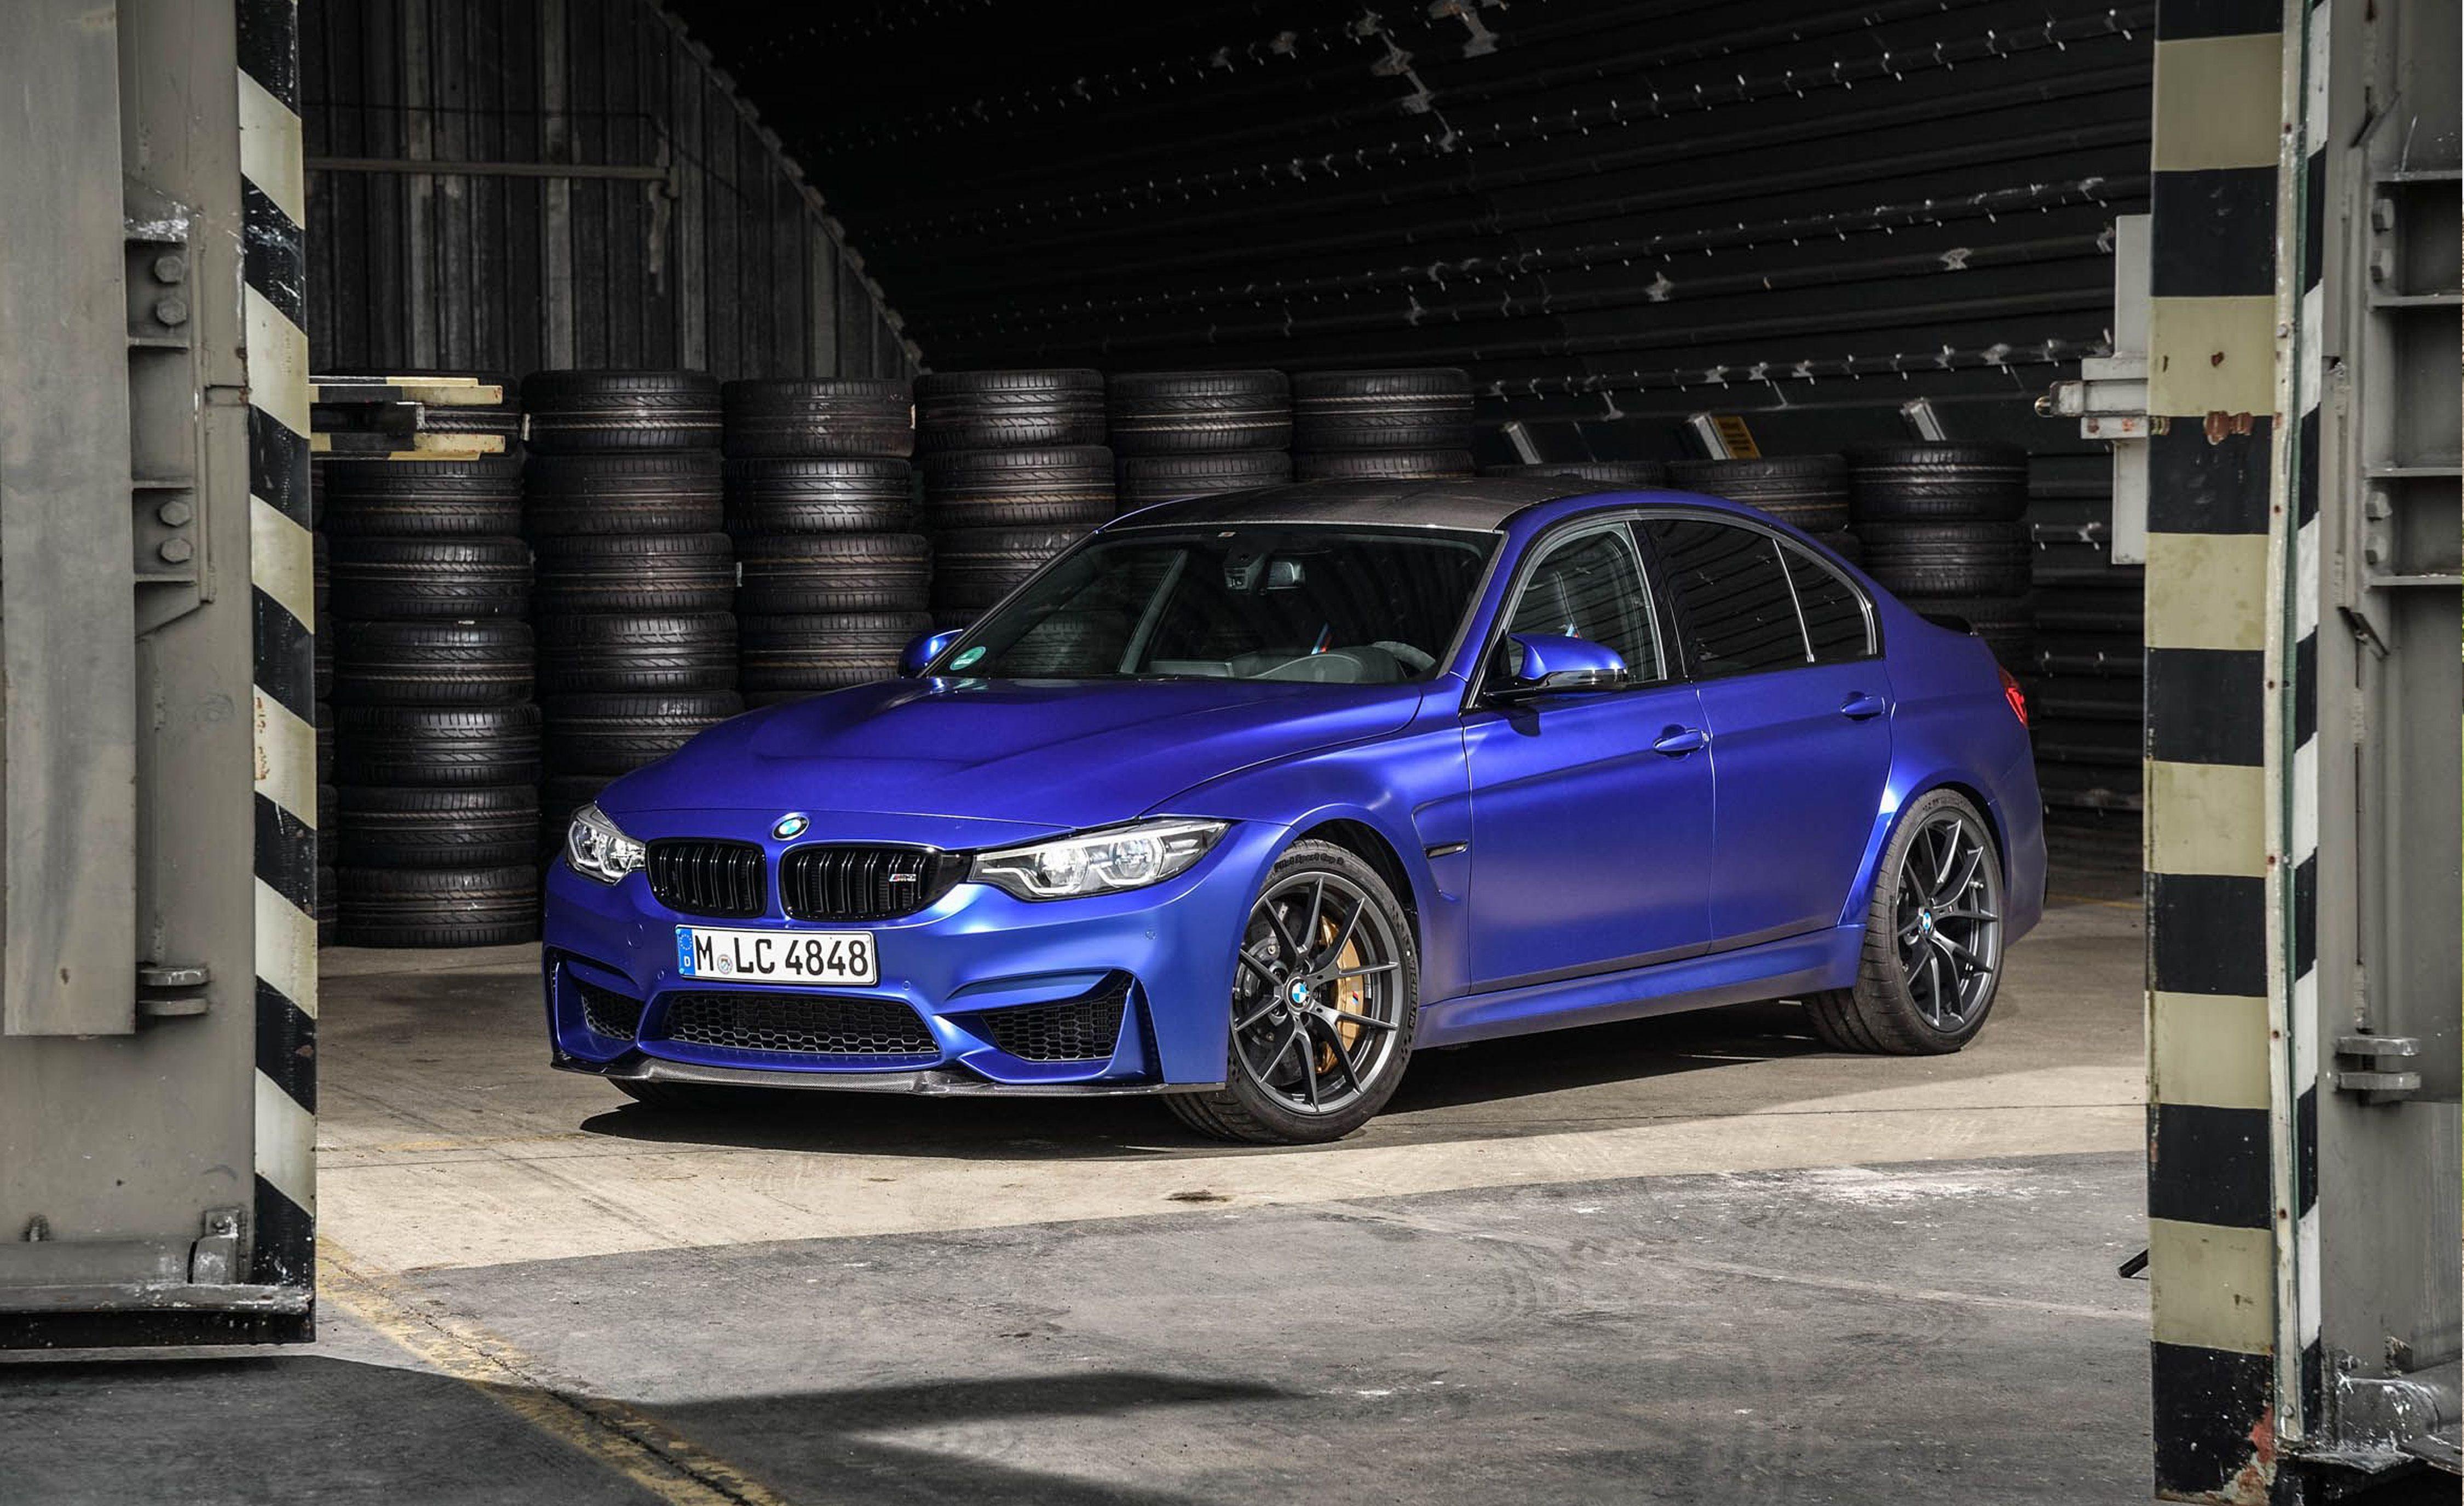 2020 BMW M3 Reviews | BMW M3 Price, Photos, and Specs ...